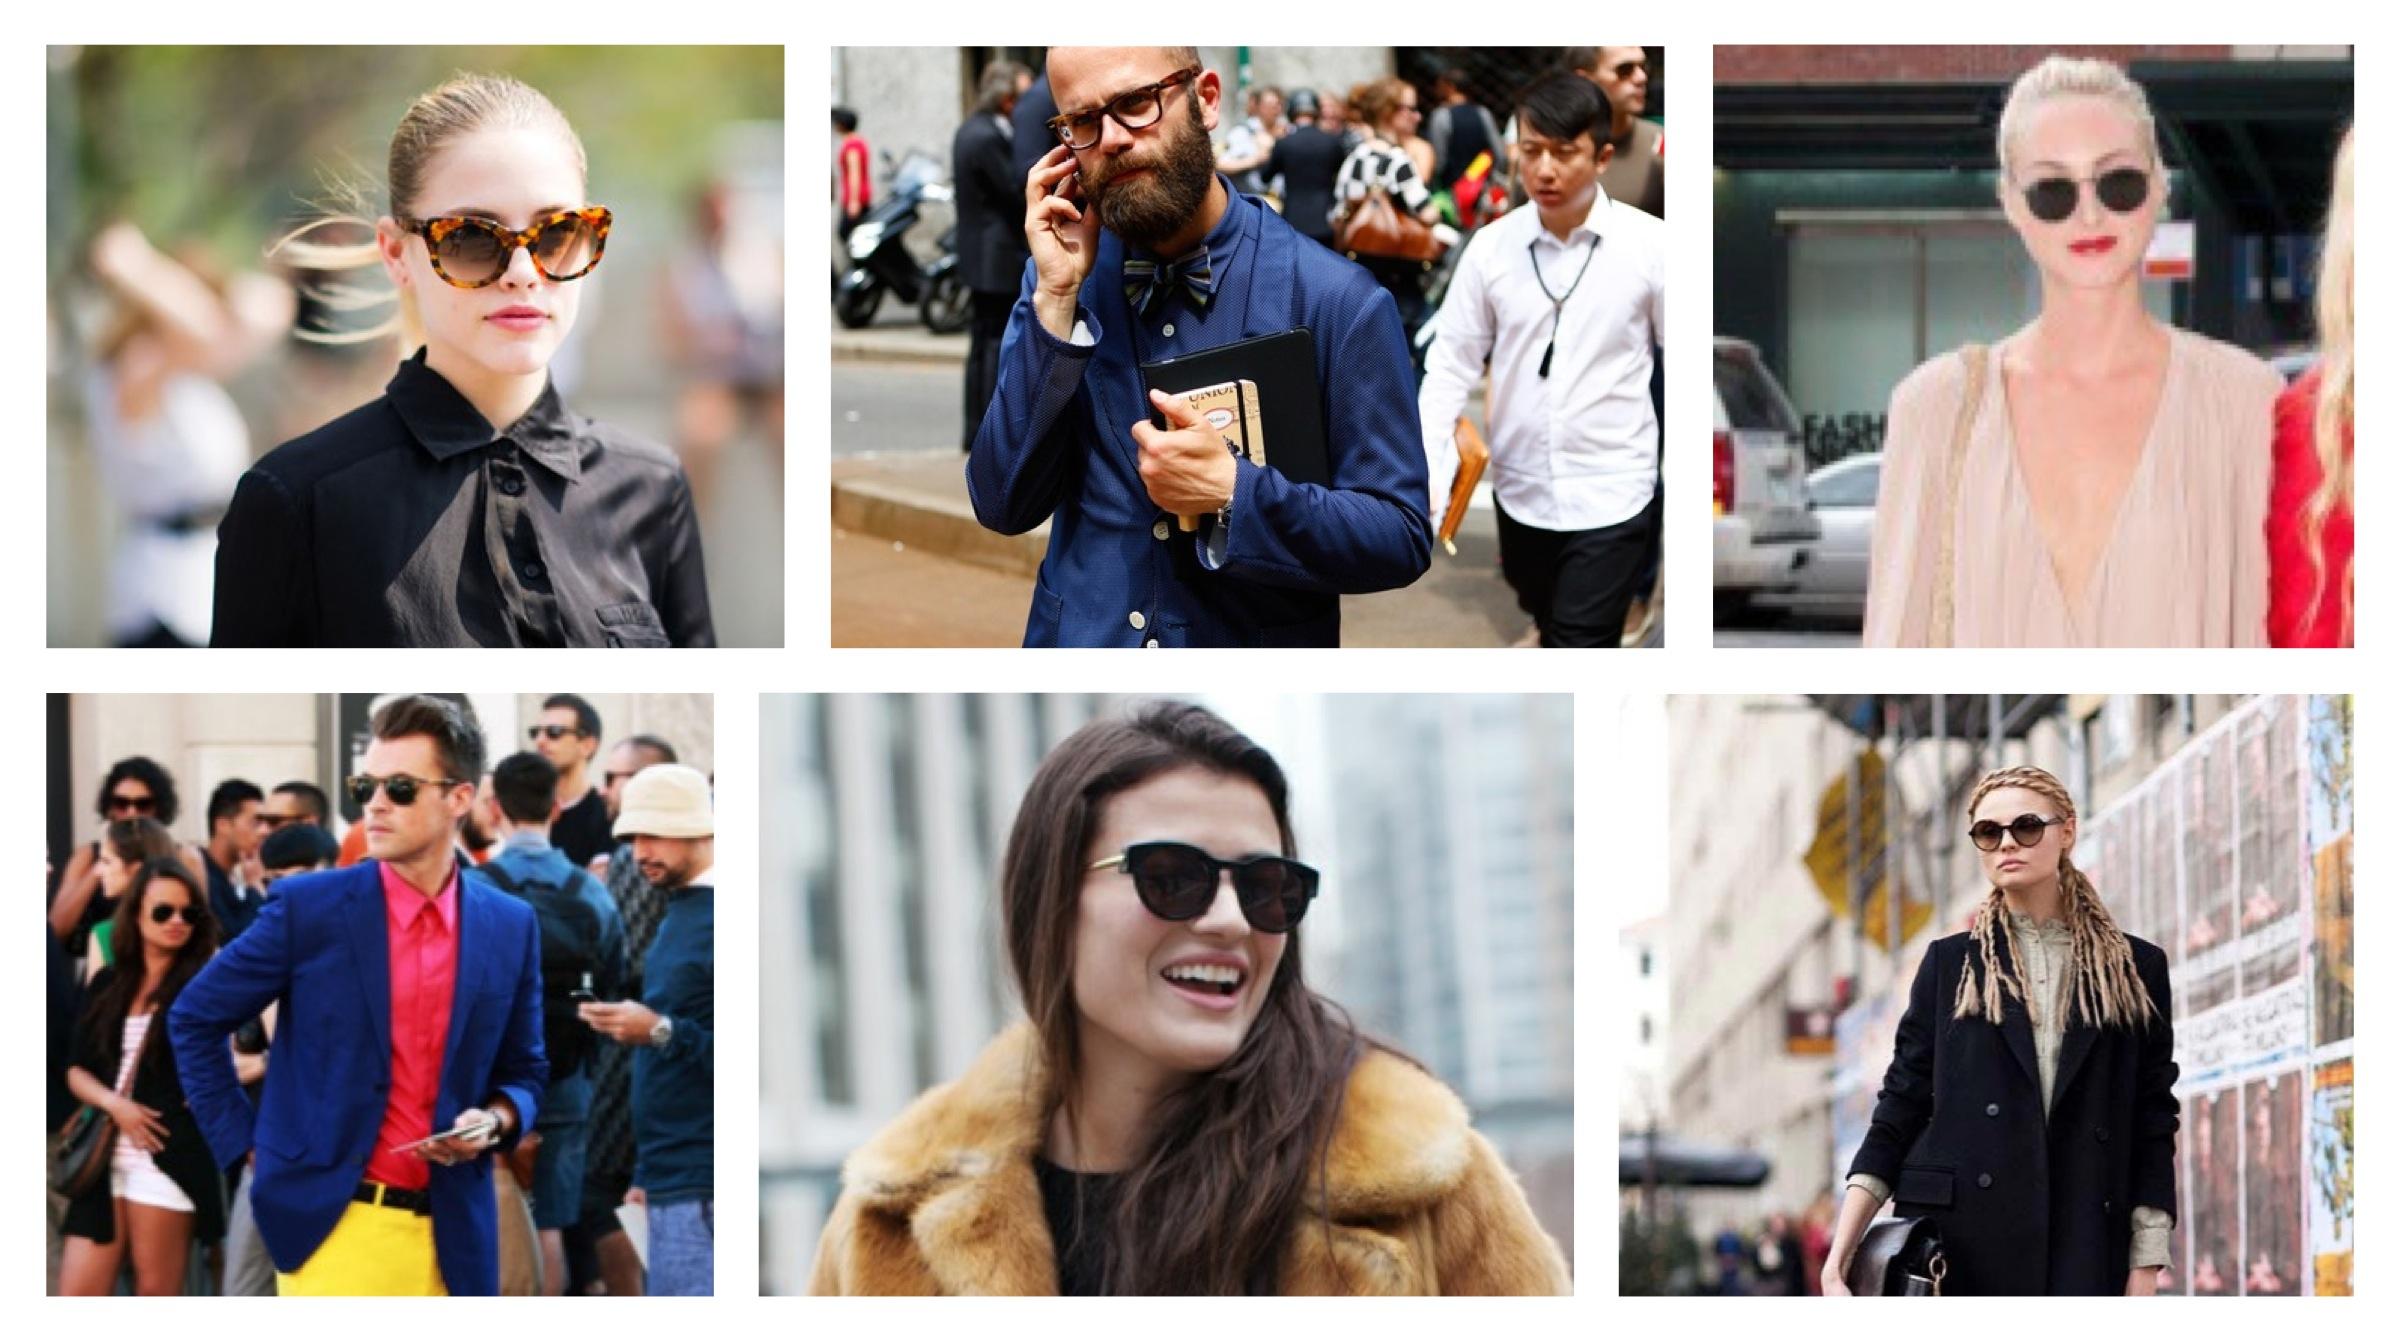 FashionWeek_StreetFashion_Sunglasses_StreetStyle_ShadesDaddy